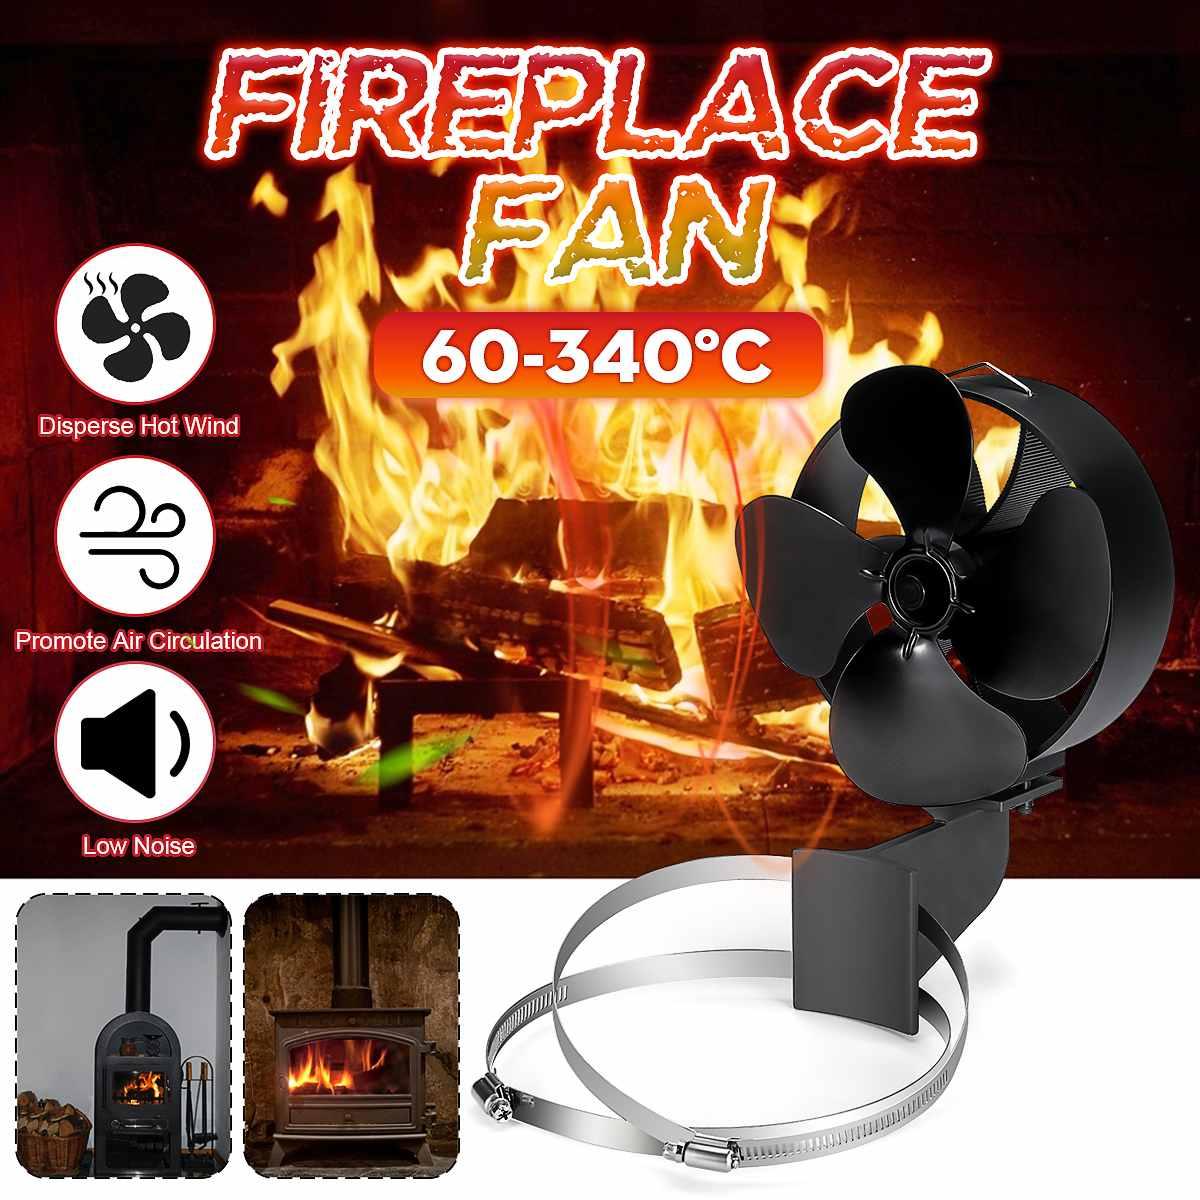 Black Stove Fan 4 Blade Fireplace Fan Chimney Tube Device Safety Double Metal Ring Heat Distribution Fuel Saving+Hoop Device